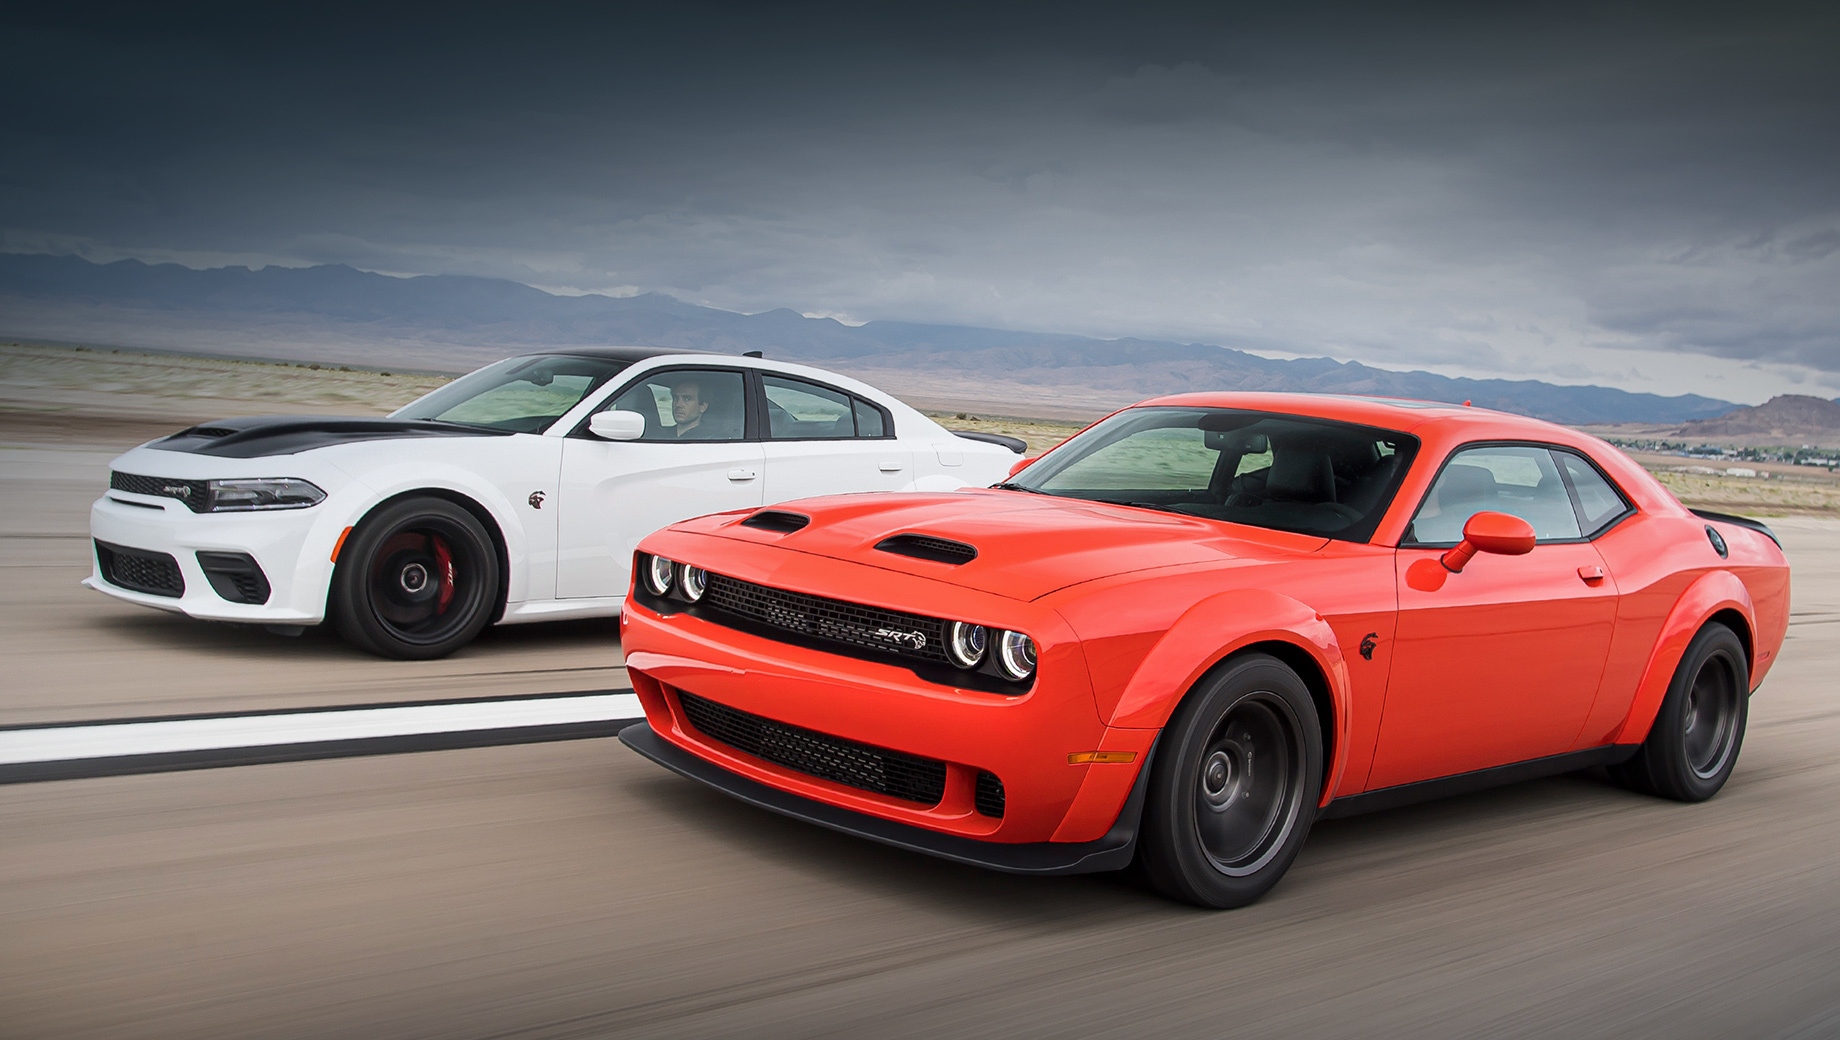 Модели Dodge Challenger и Charger оказались ещё безумнее